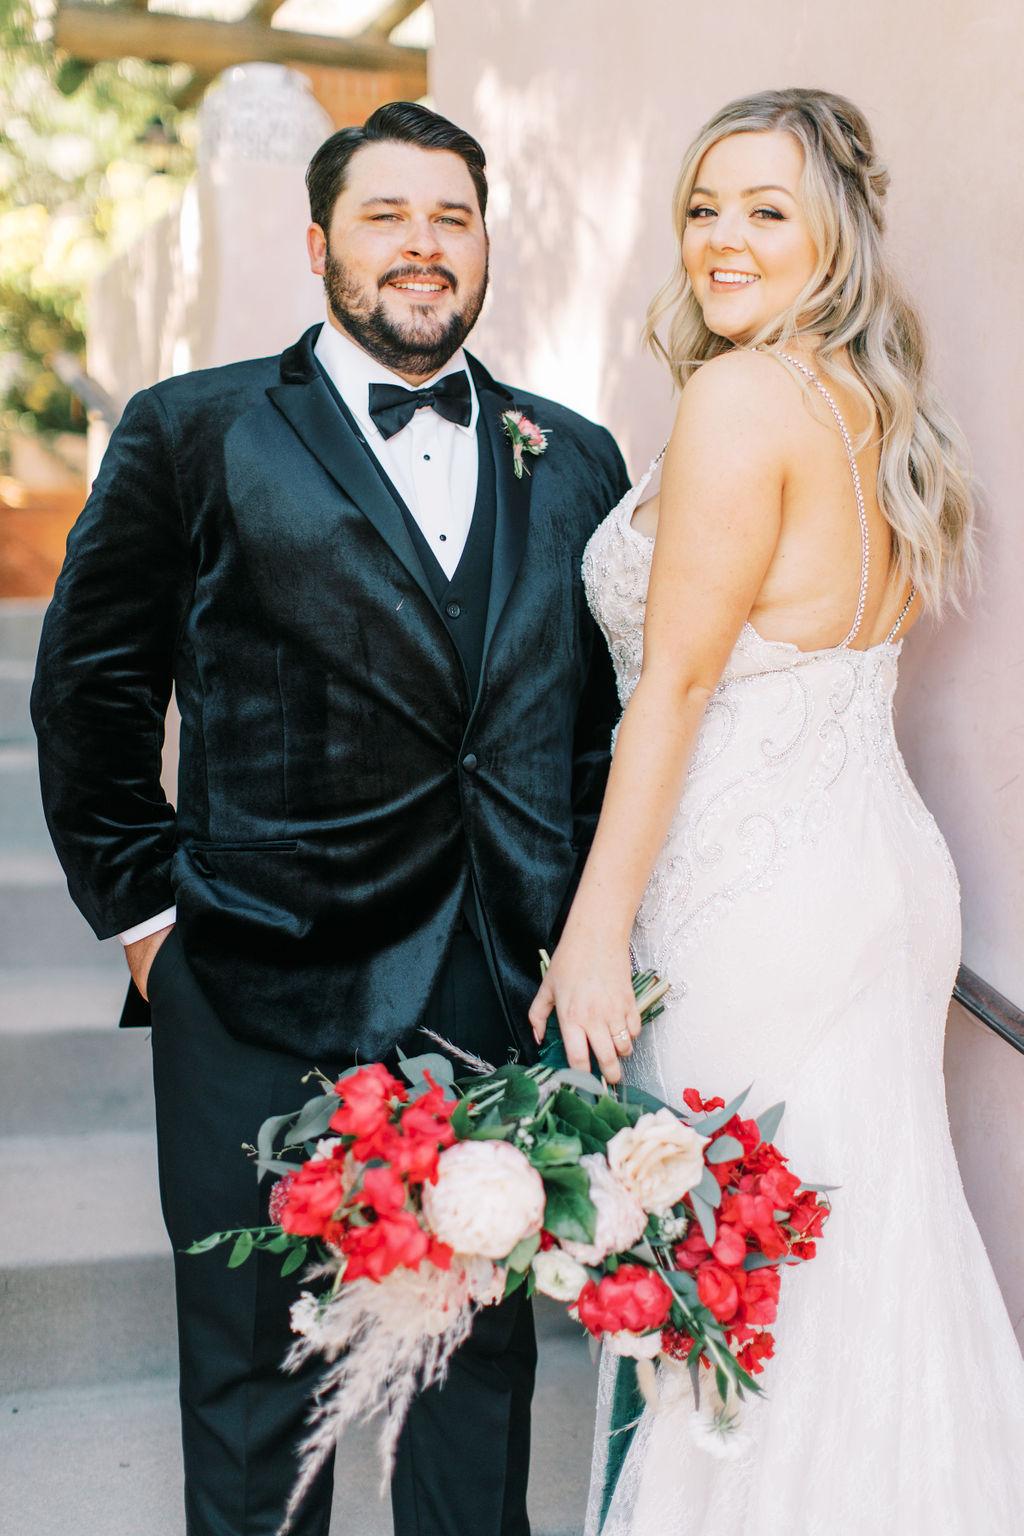 meagan robert wedding bride and groom